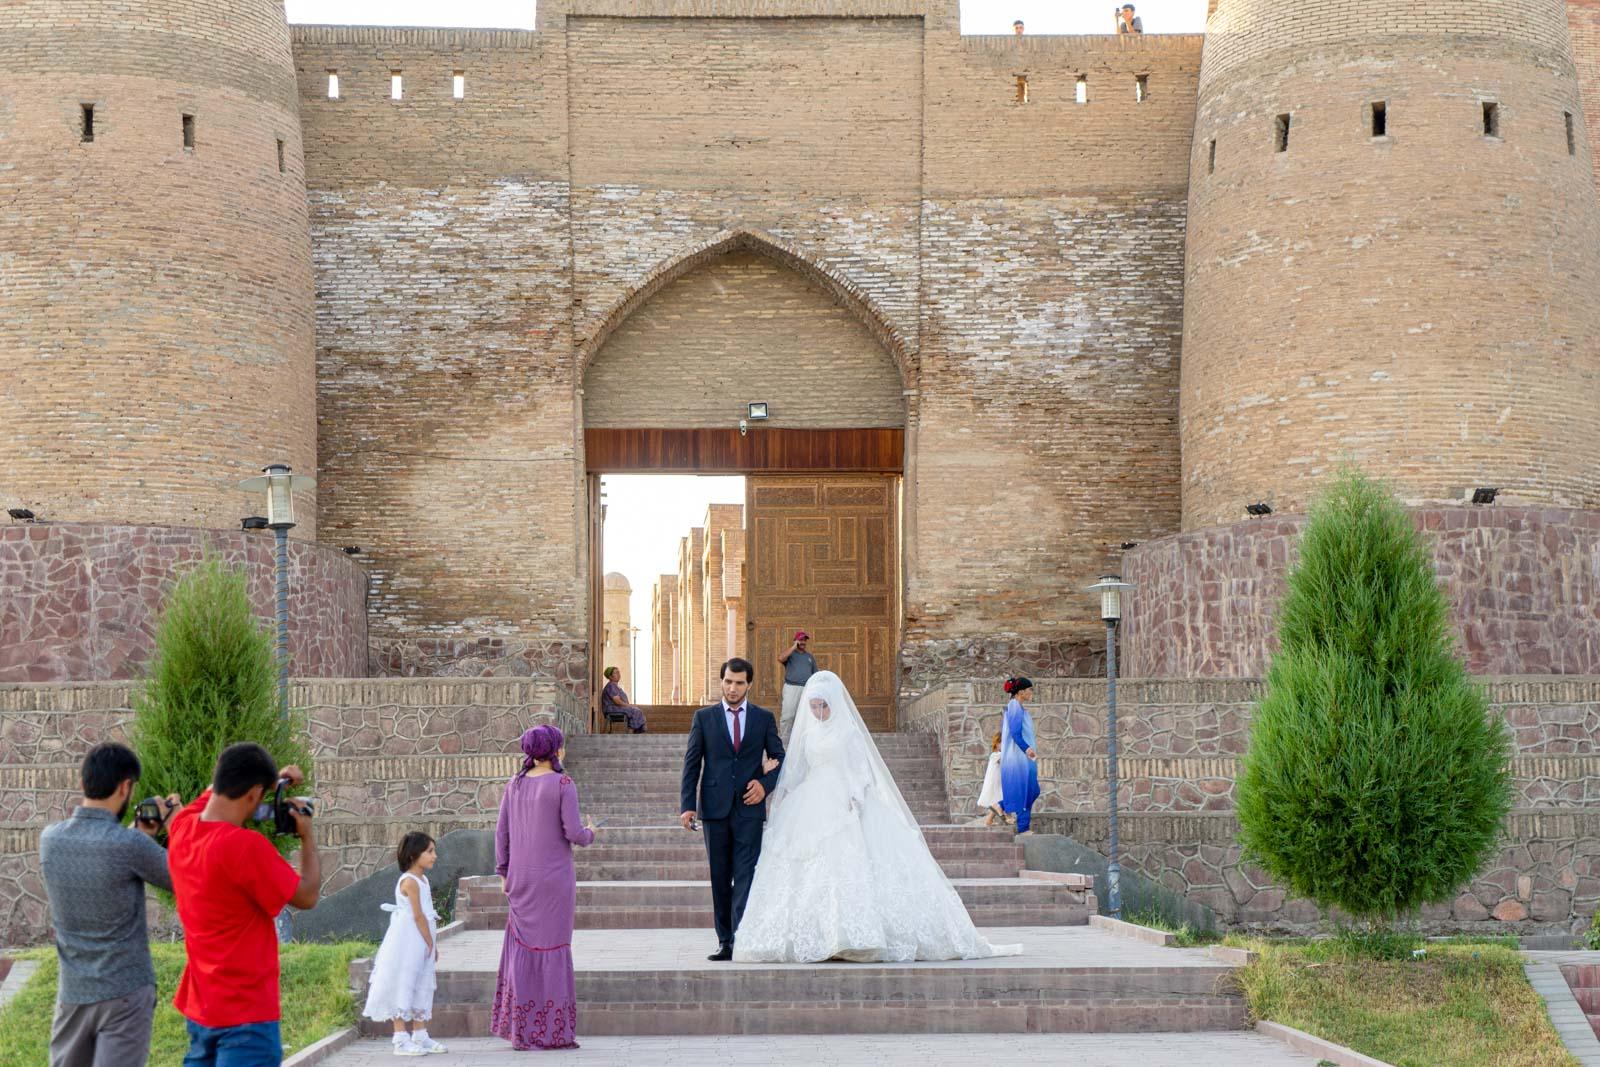 Hisor Fortress from Dushanbe, Tajikistan